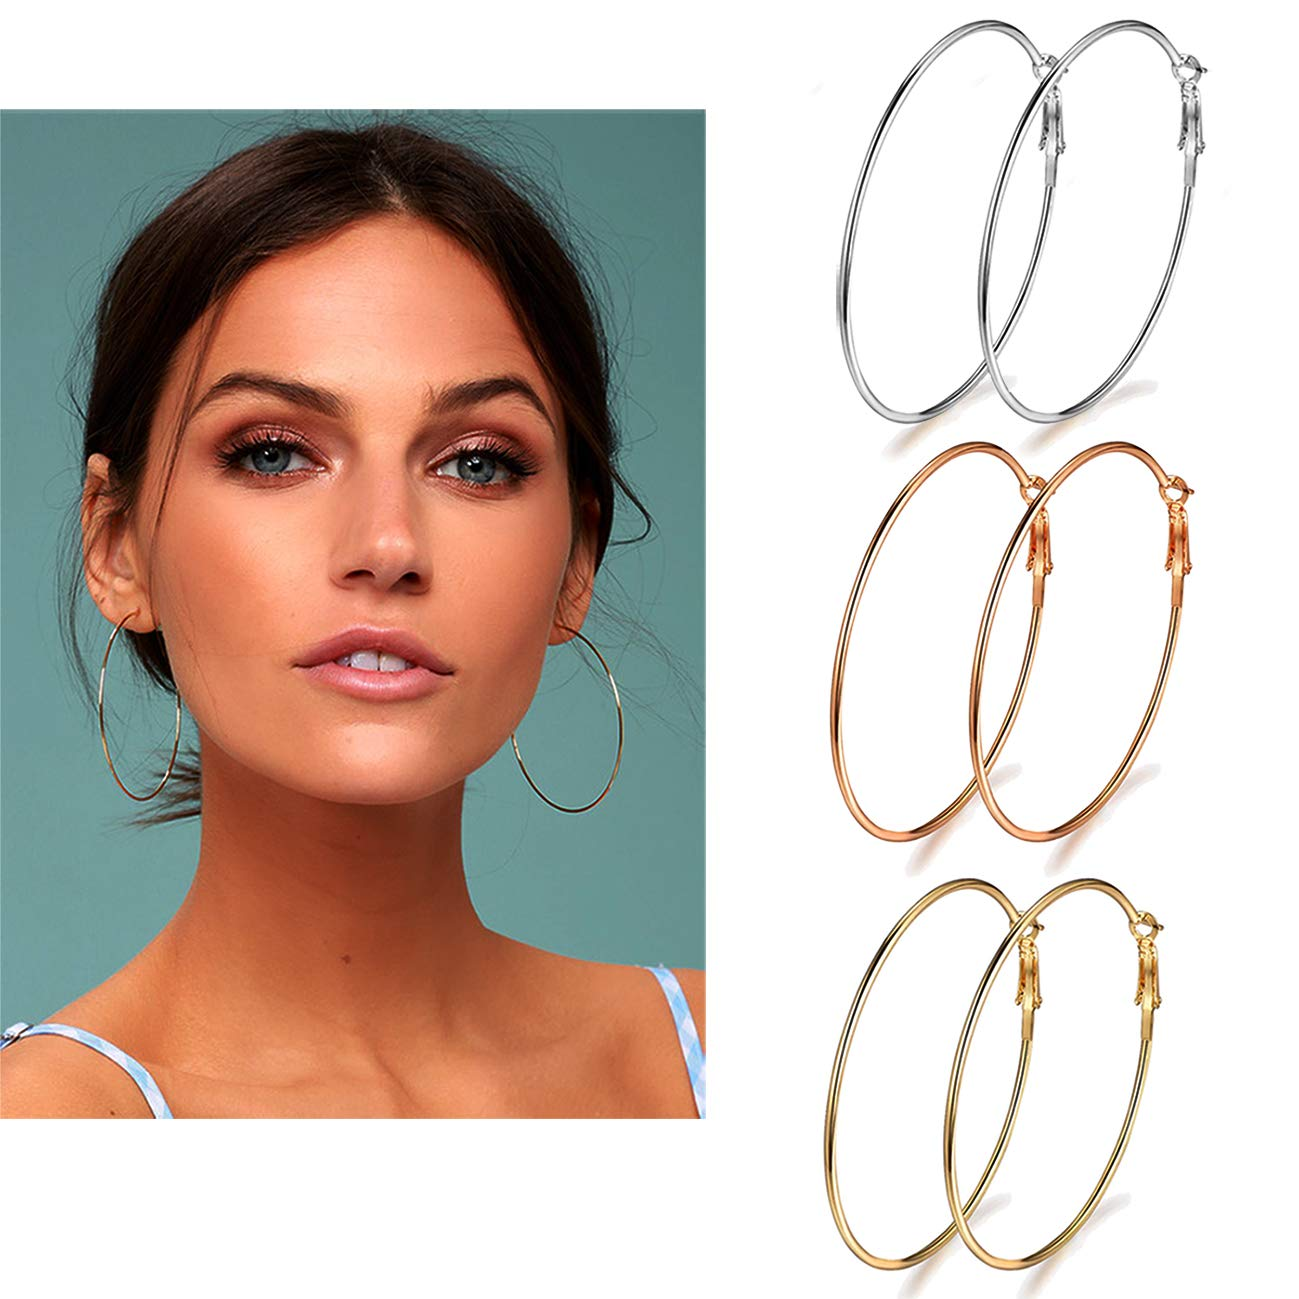 Holfeun 3 Pairs Big Hoop Earrings, Stainless Steel Hoop Earrings in Gold Plated Rose Gold Plated Silver for Women Girls (70mm) by Holfeun